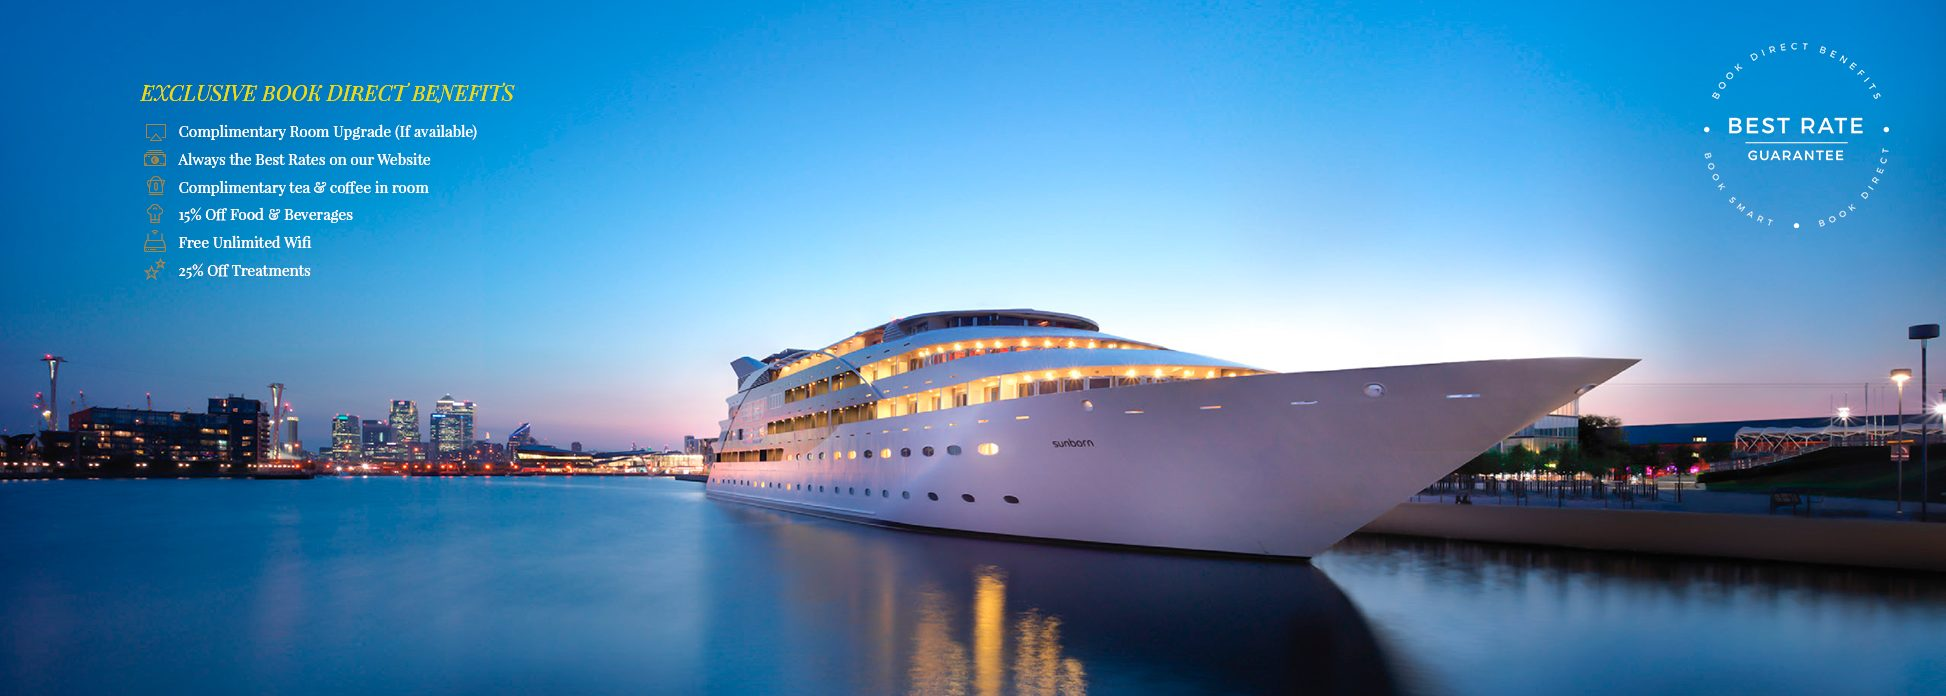 Hotels Near Excel London Docklands